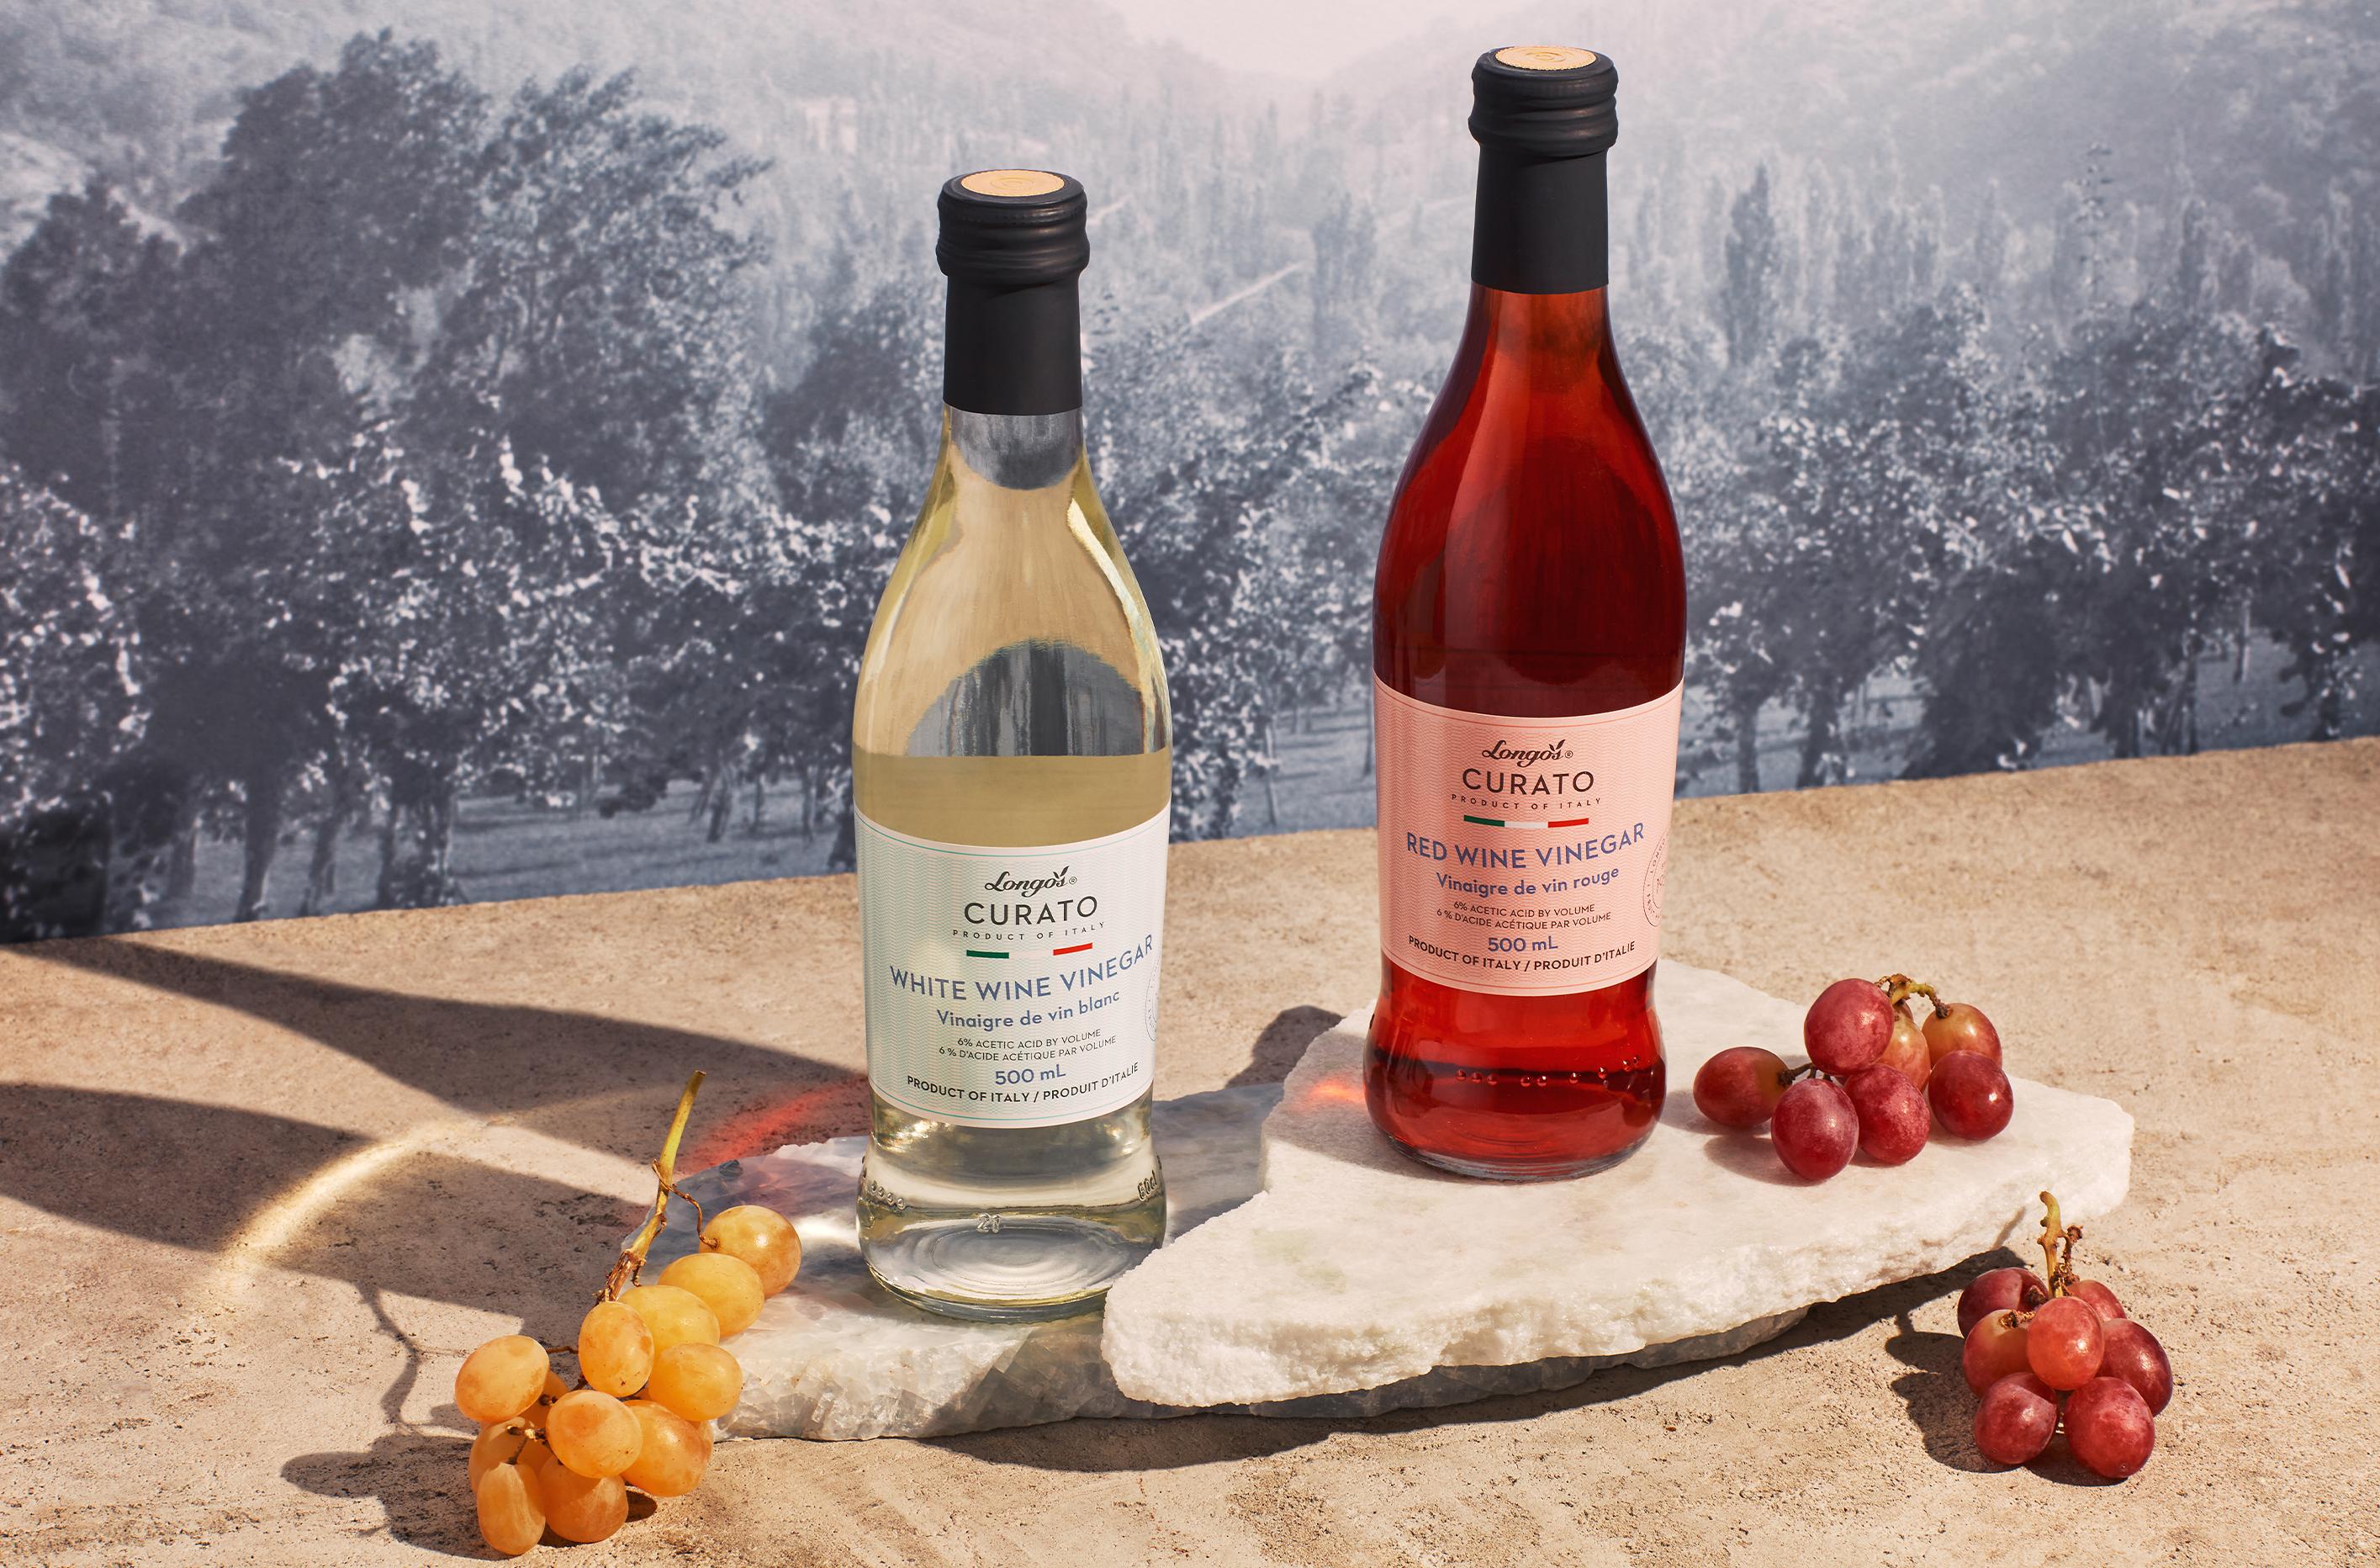 Longo's Curato Vinegars